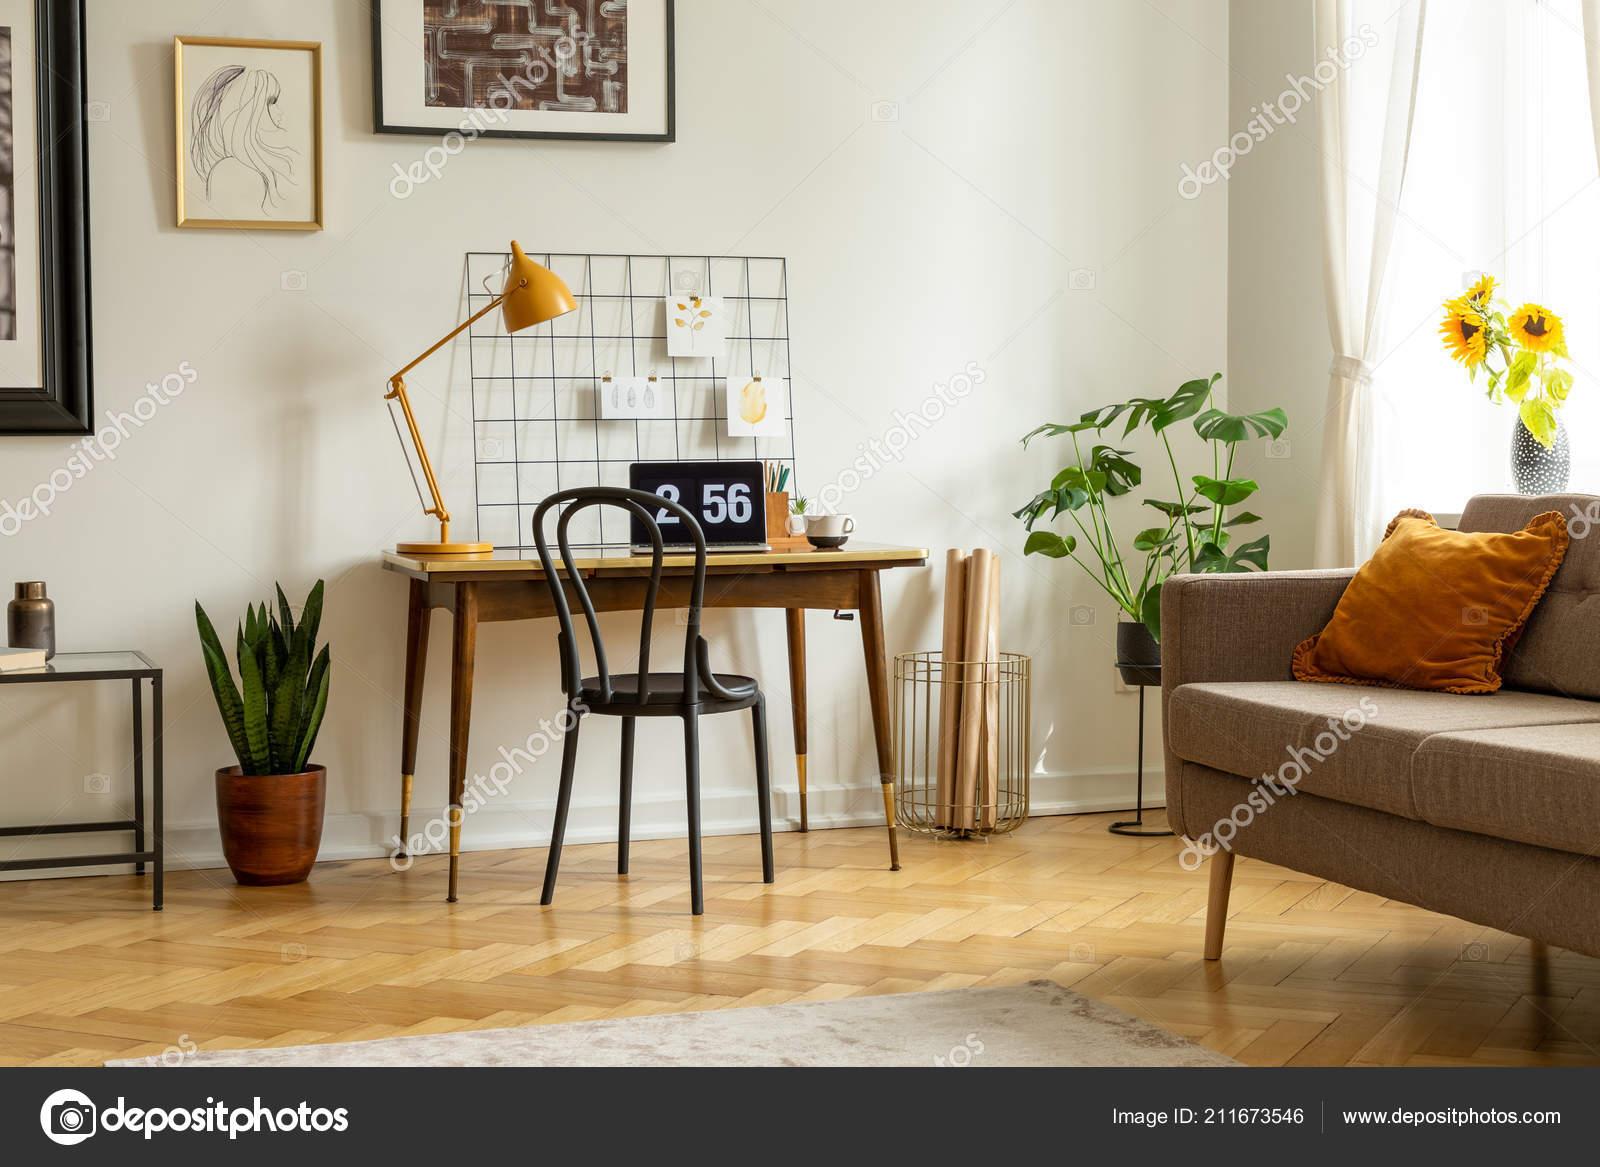 Peachy Plant Next Chair Desk Lamp Laptop Flat Interior Couch Real Frankydiablos Diy Chair Ideas Frankydiabloscom